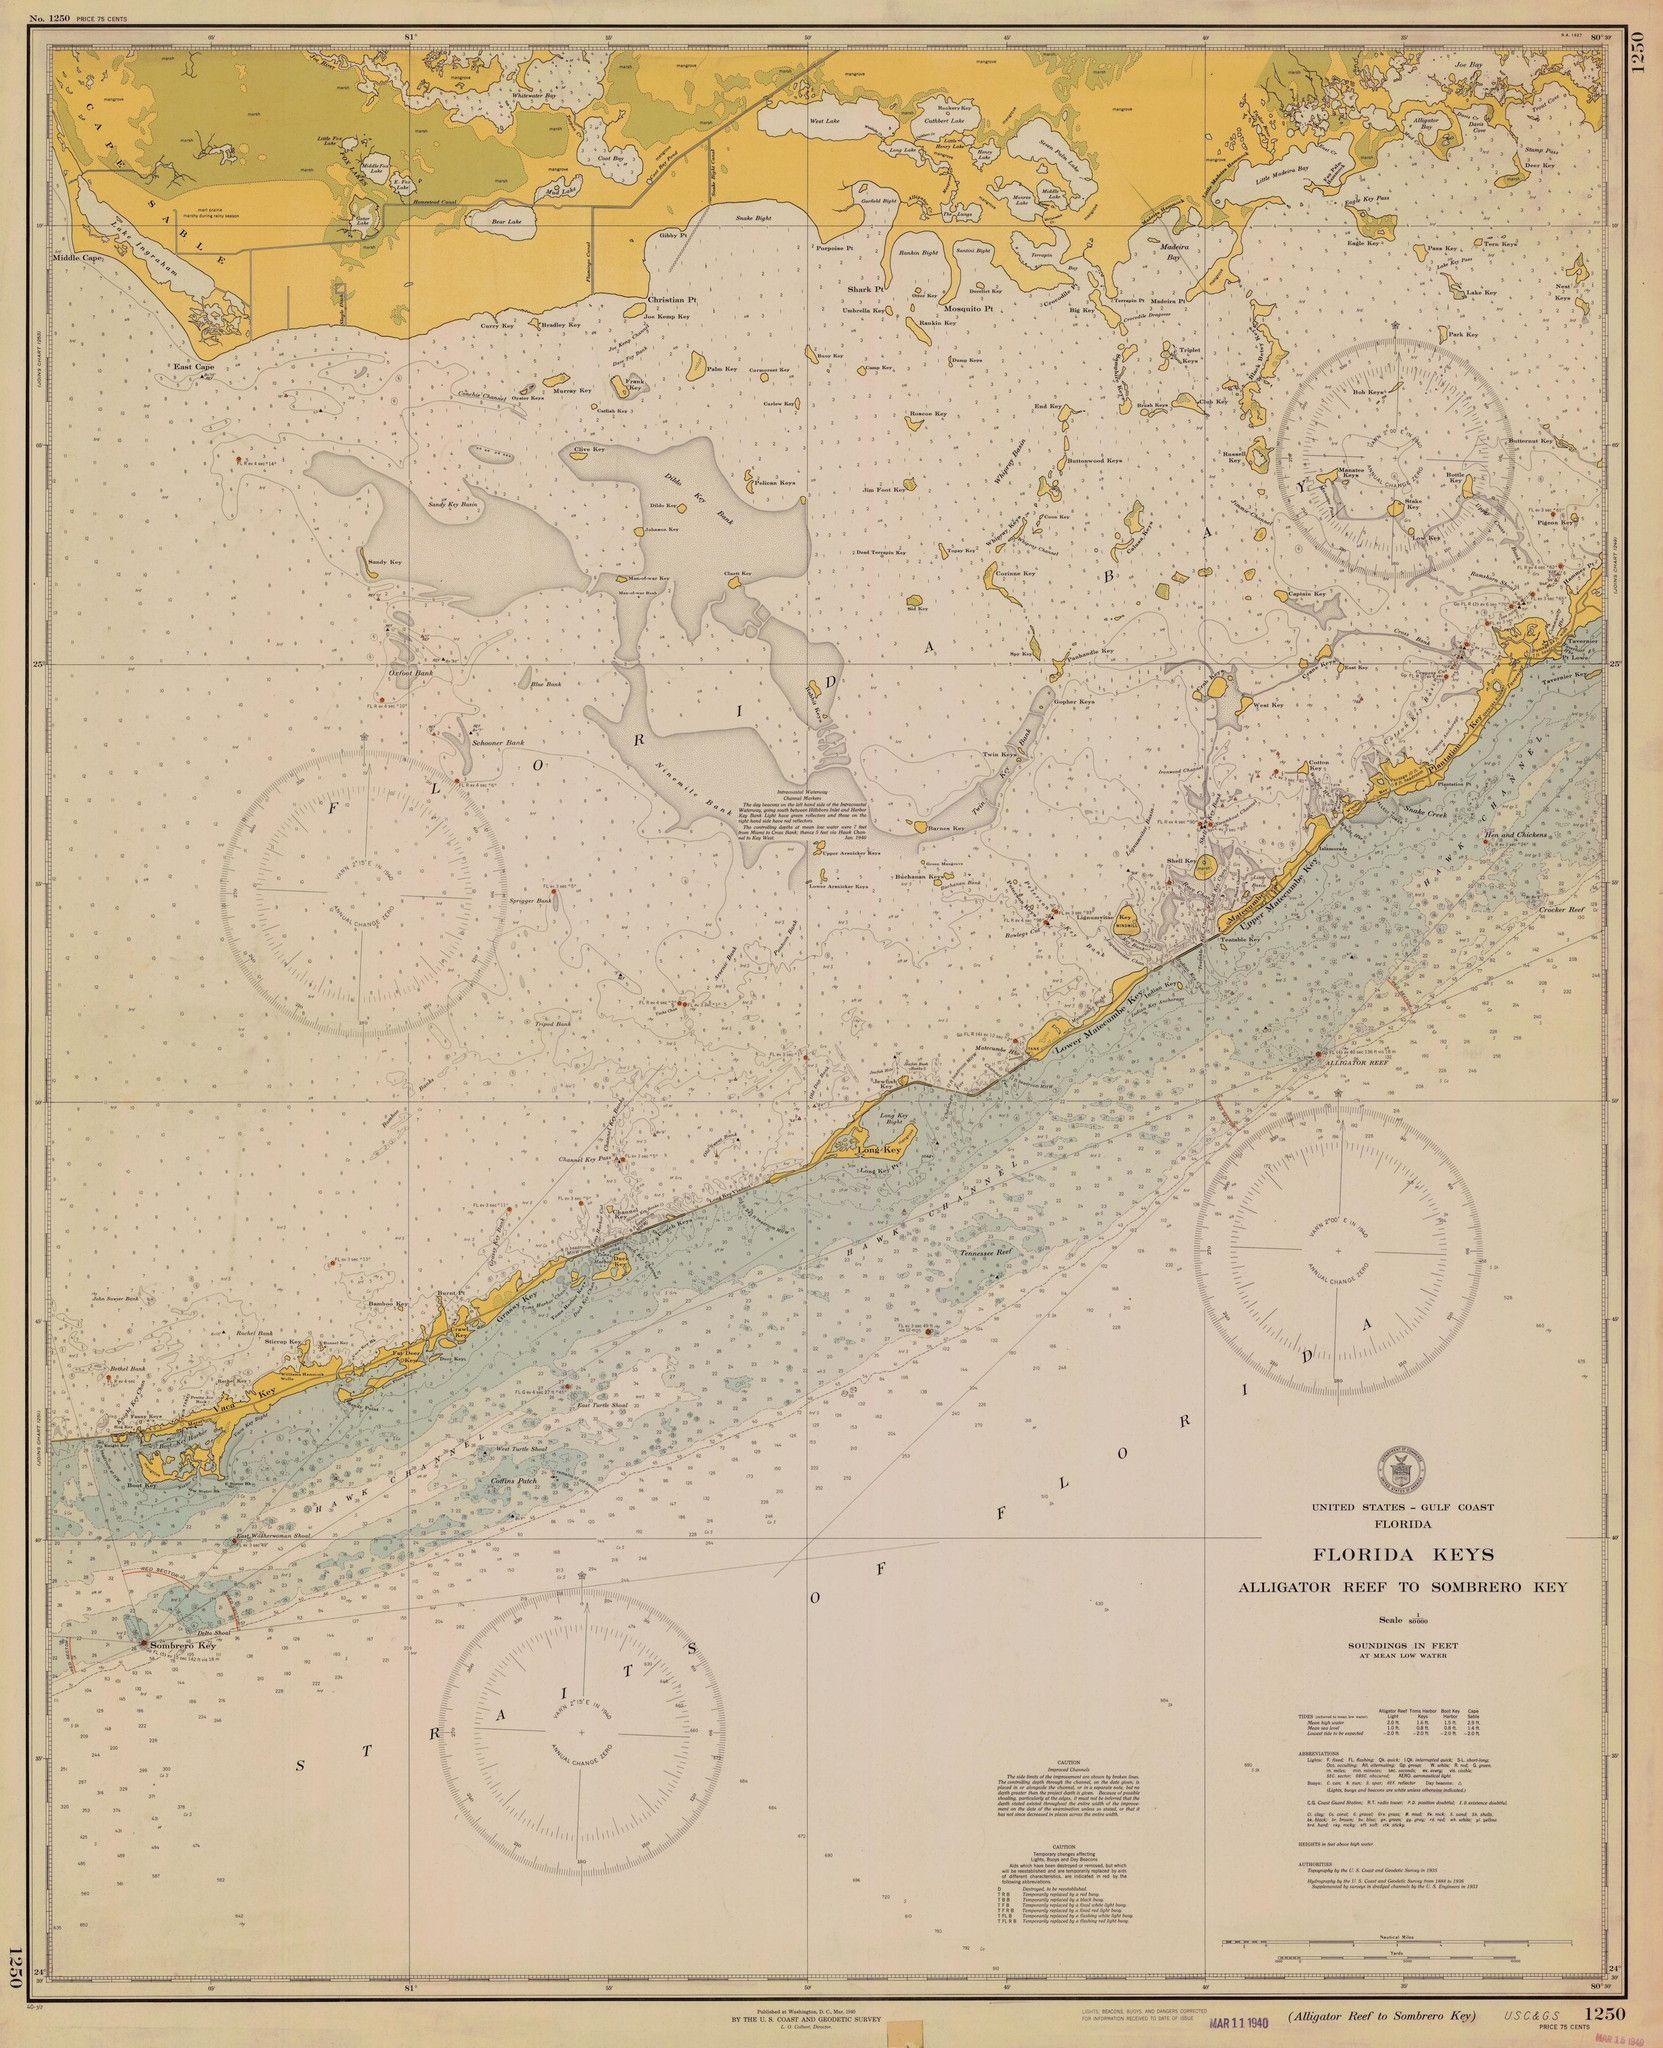 Florida Keys Historical Map Florida Keys And Products - Florida keys us map